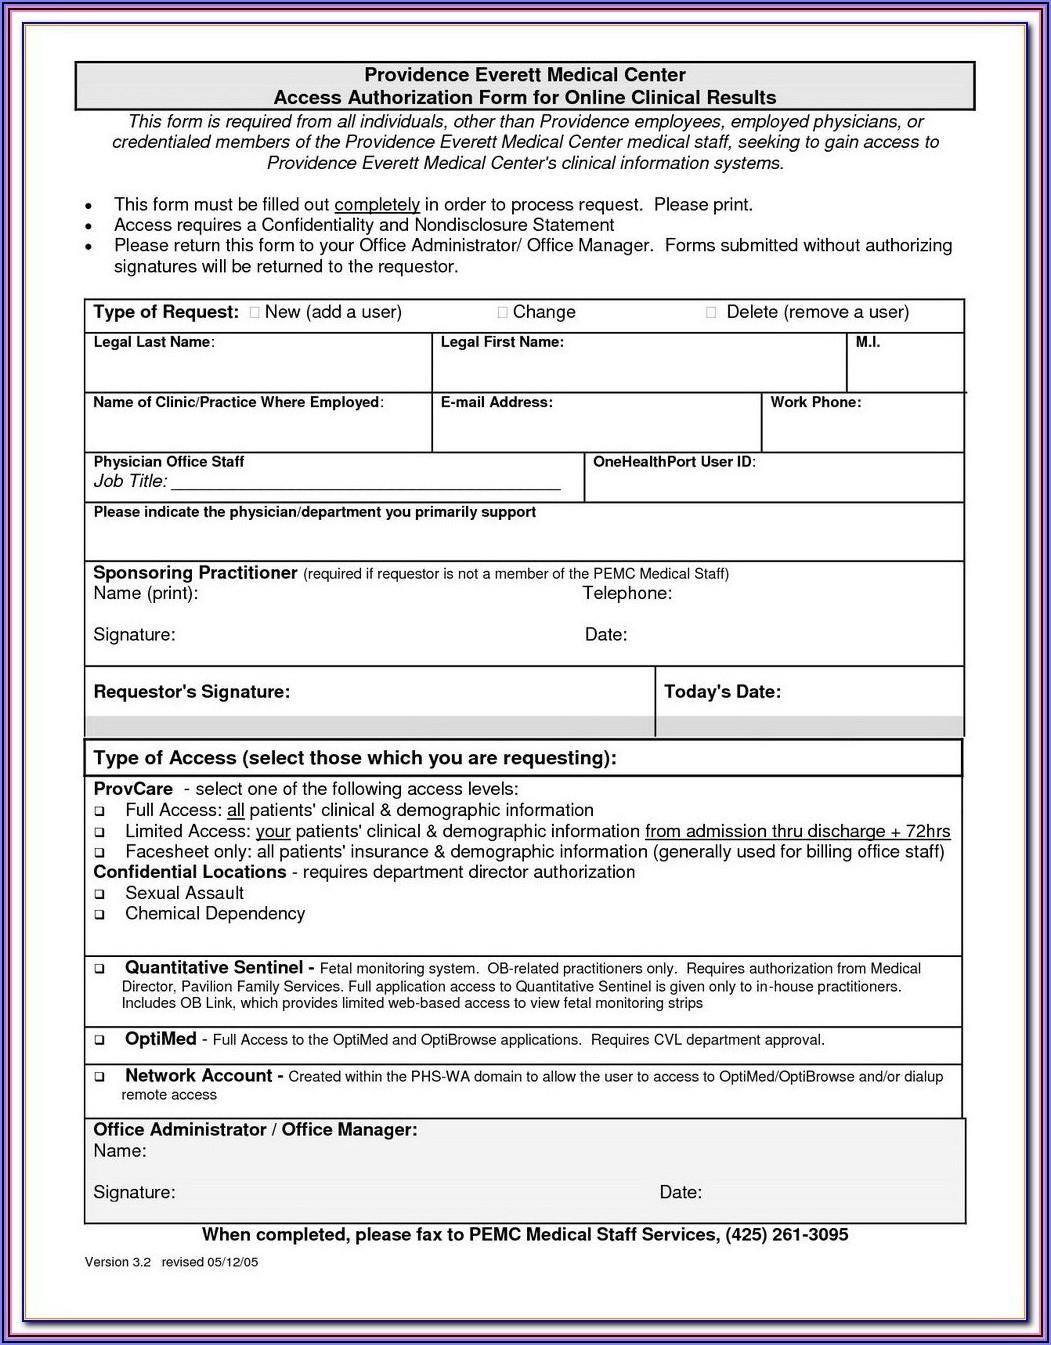 Cms 1500 Form Pdf Fillable Free